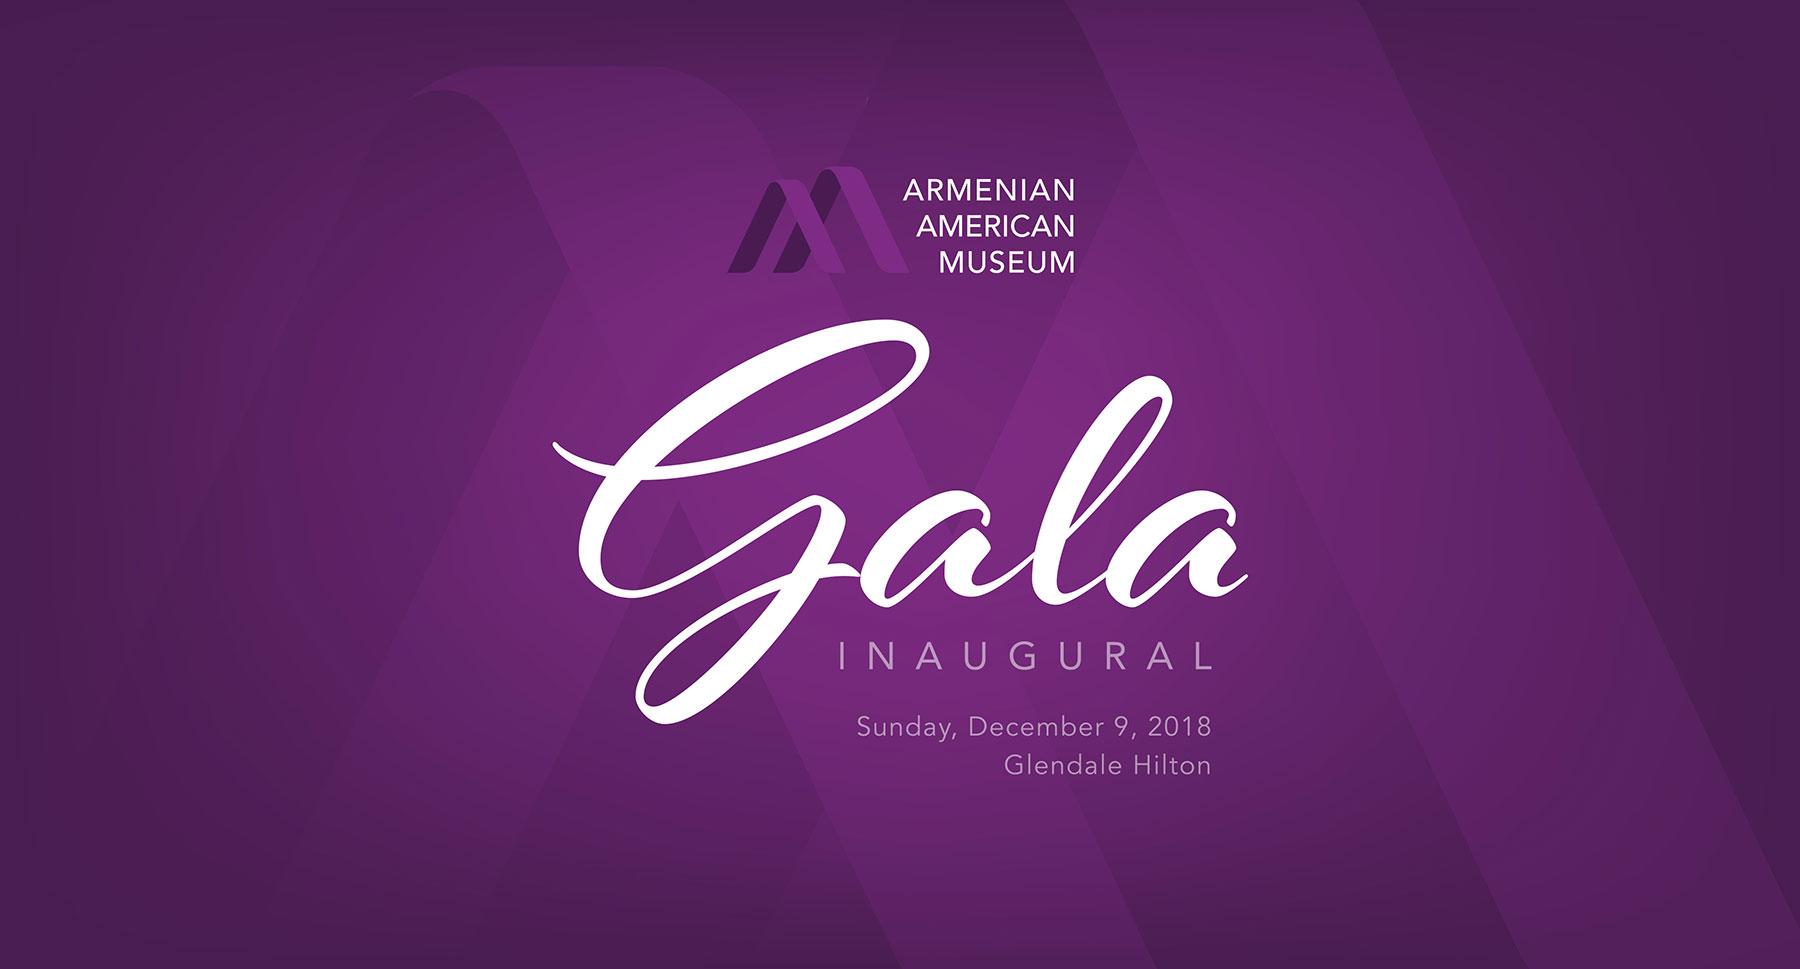 Armenian American Museum Announces Inaugural Gala